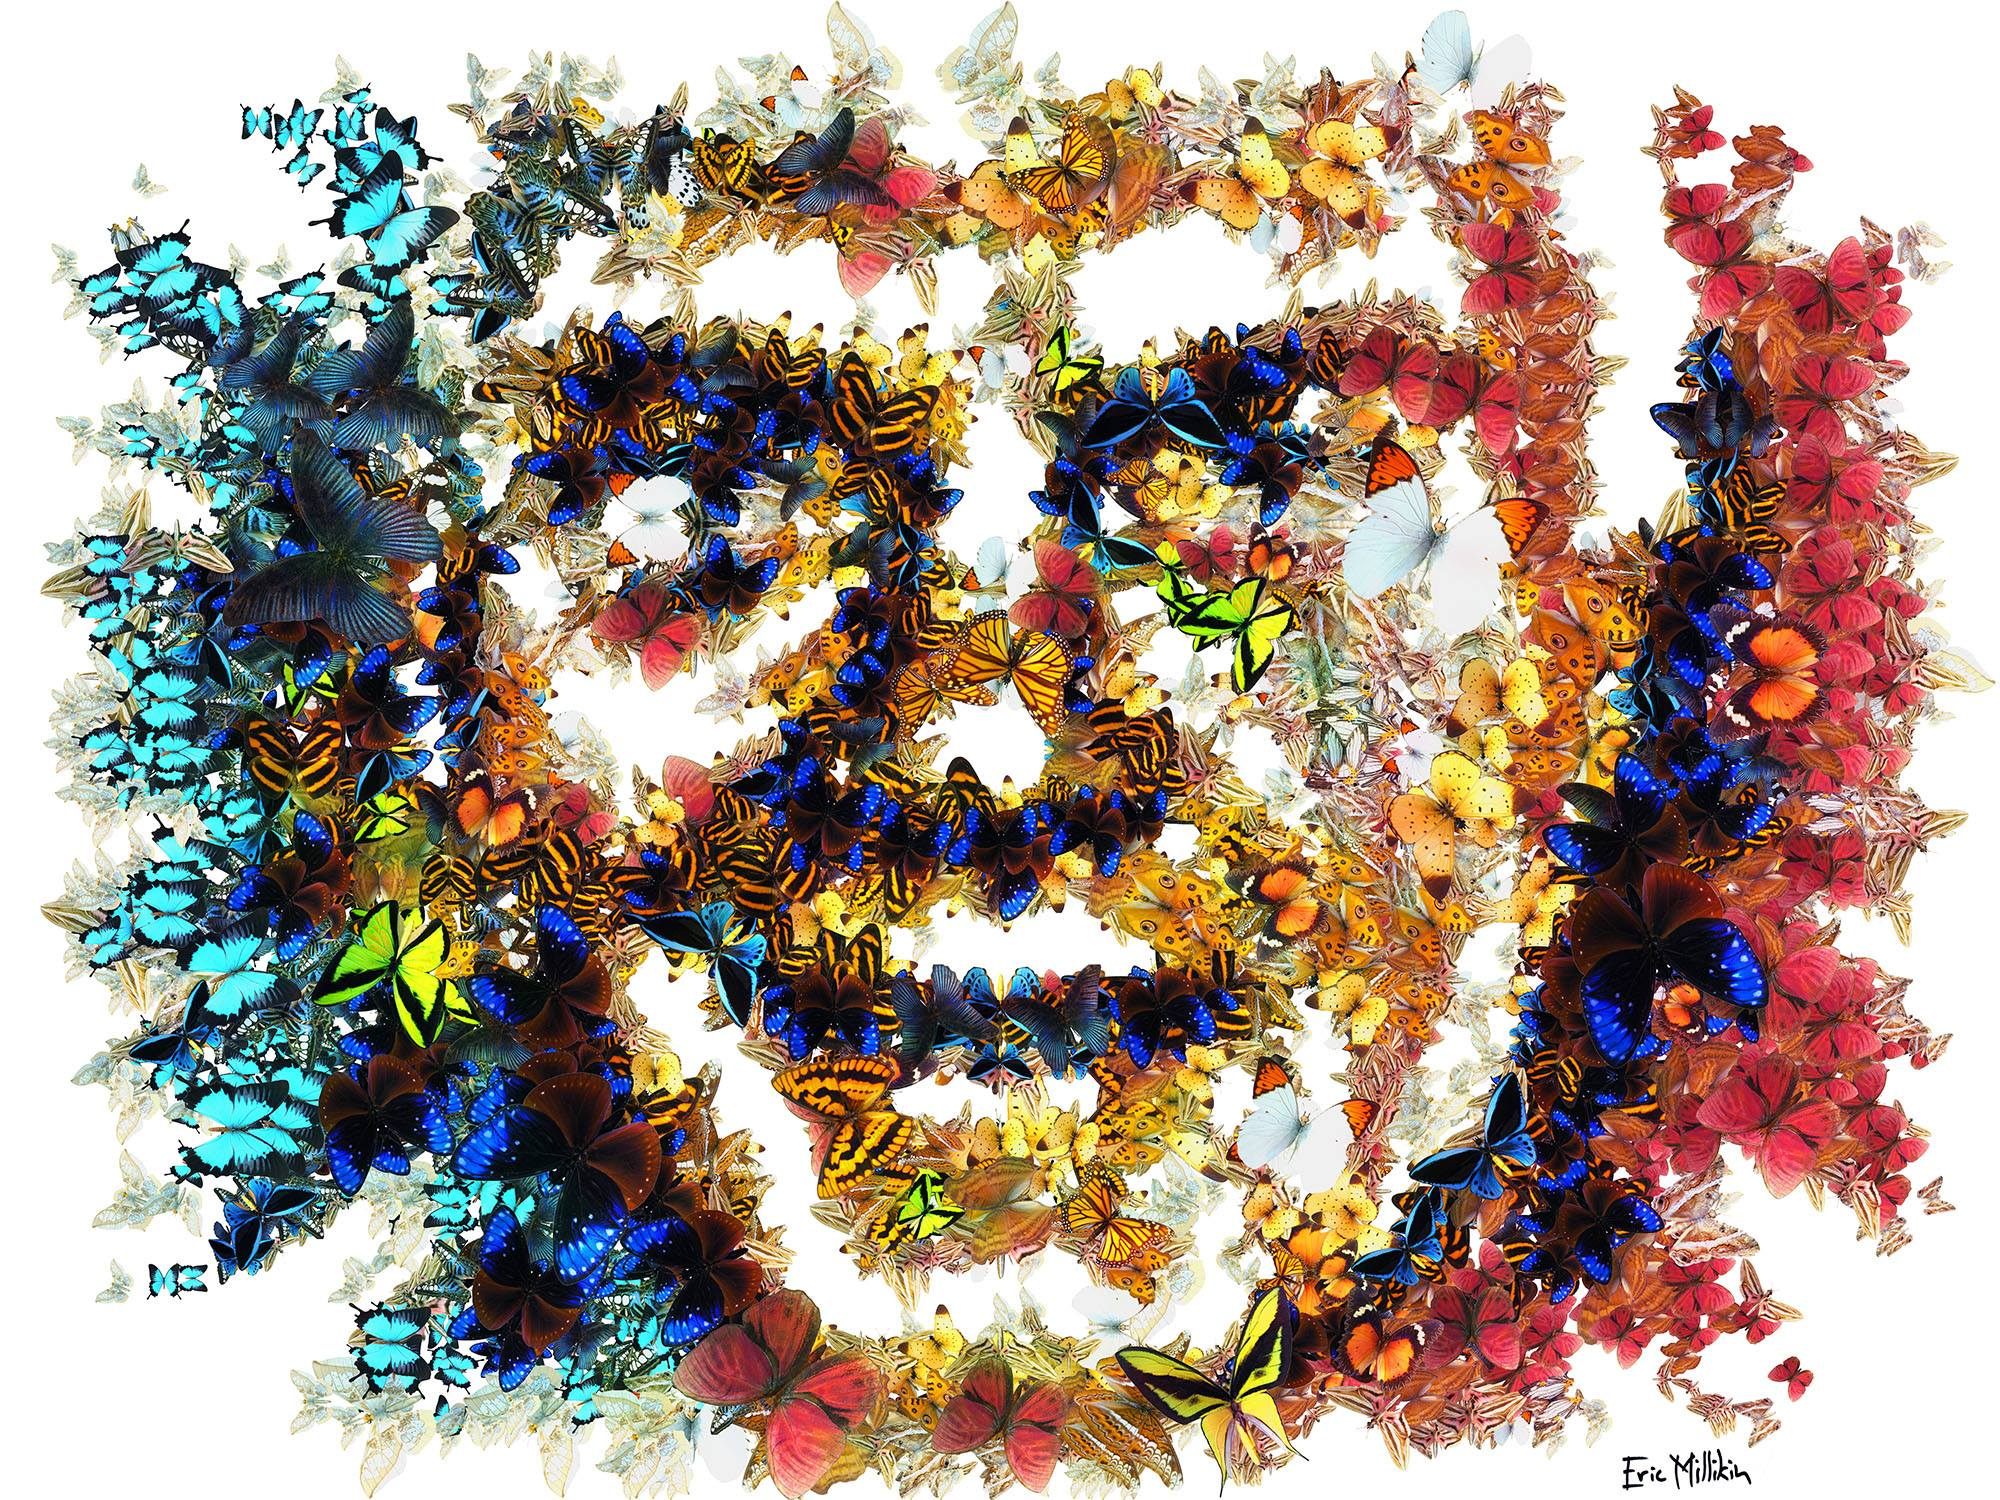 John Glenn (July 18, 1921 – Dec. 8, 2016)